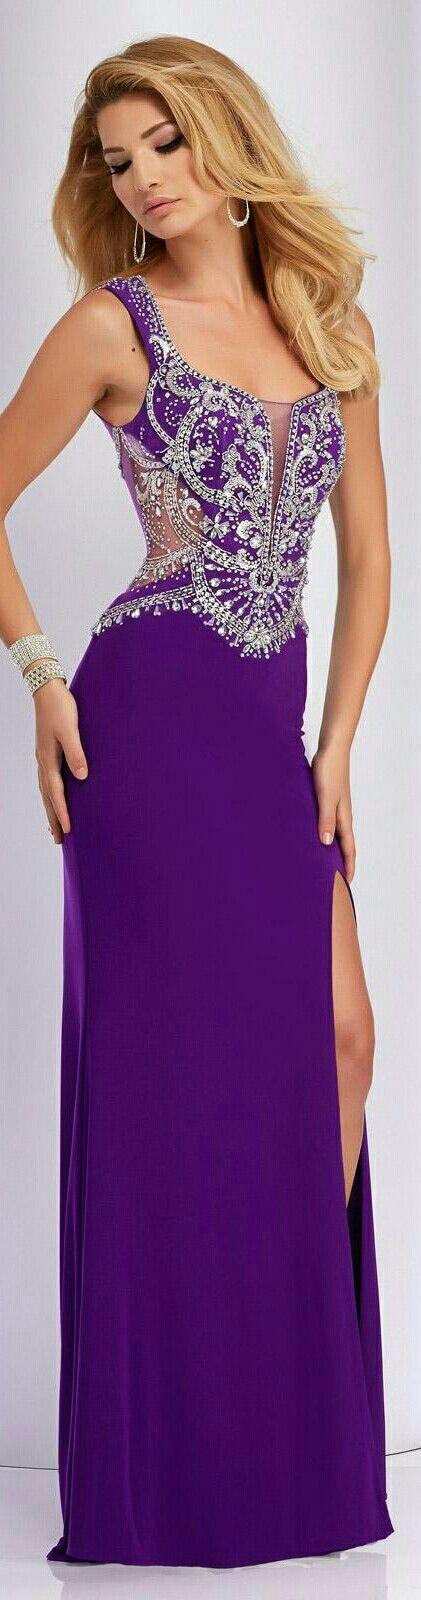 ❤Clarisse Prom Dress in Purple on Skirt w. Beaded Bodice & Shoulder Strap#2808❤                                                                                                                                                                                 Más